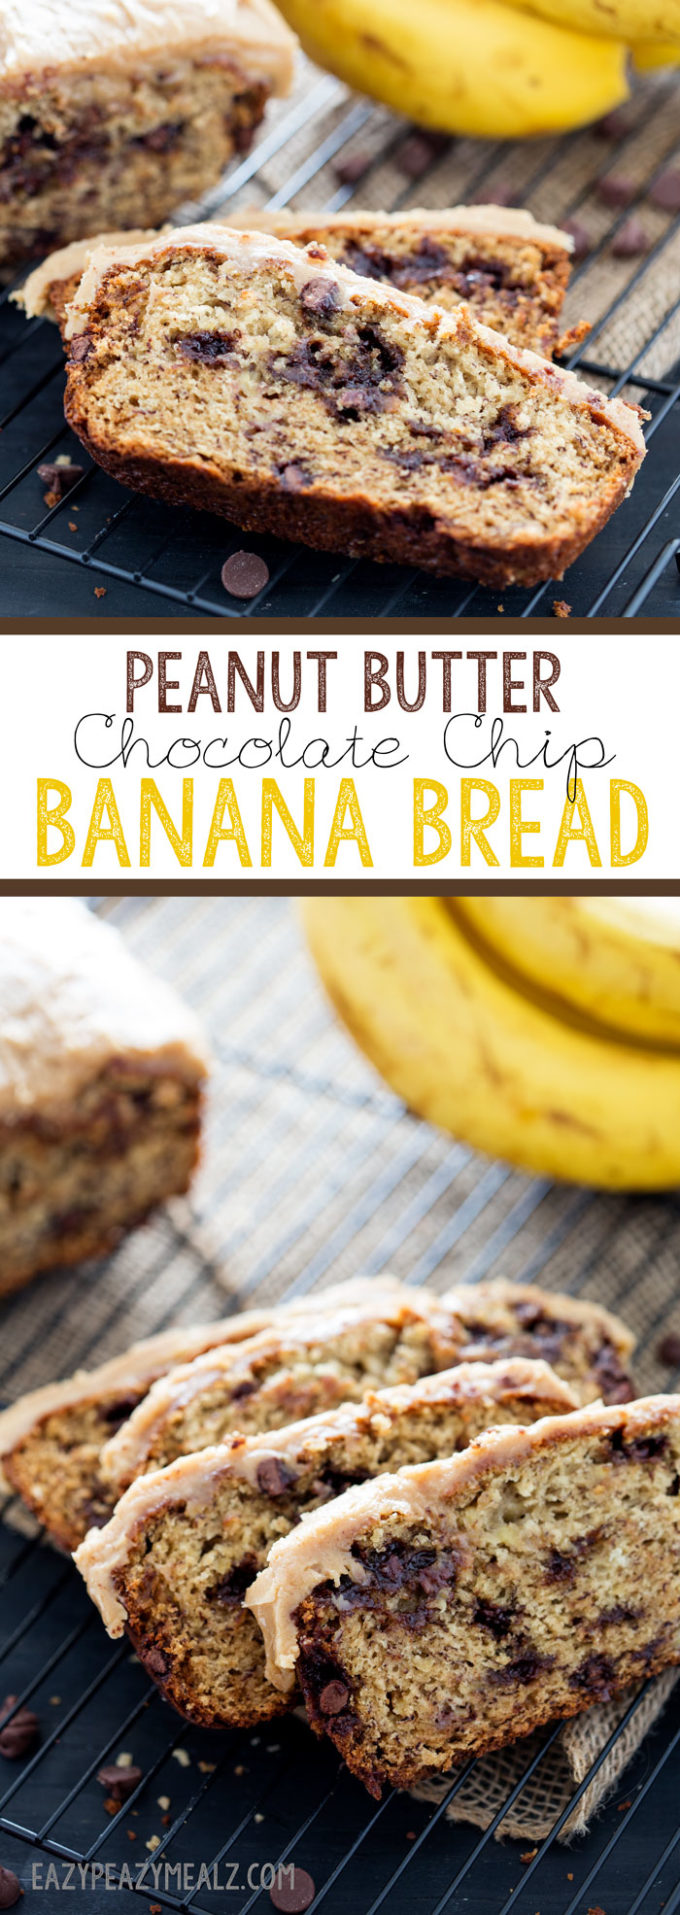 Peanut Butter Chocolate Chip Banana Bread - Eazy Peazy Mealz